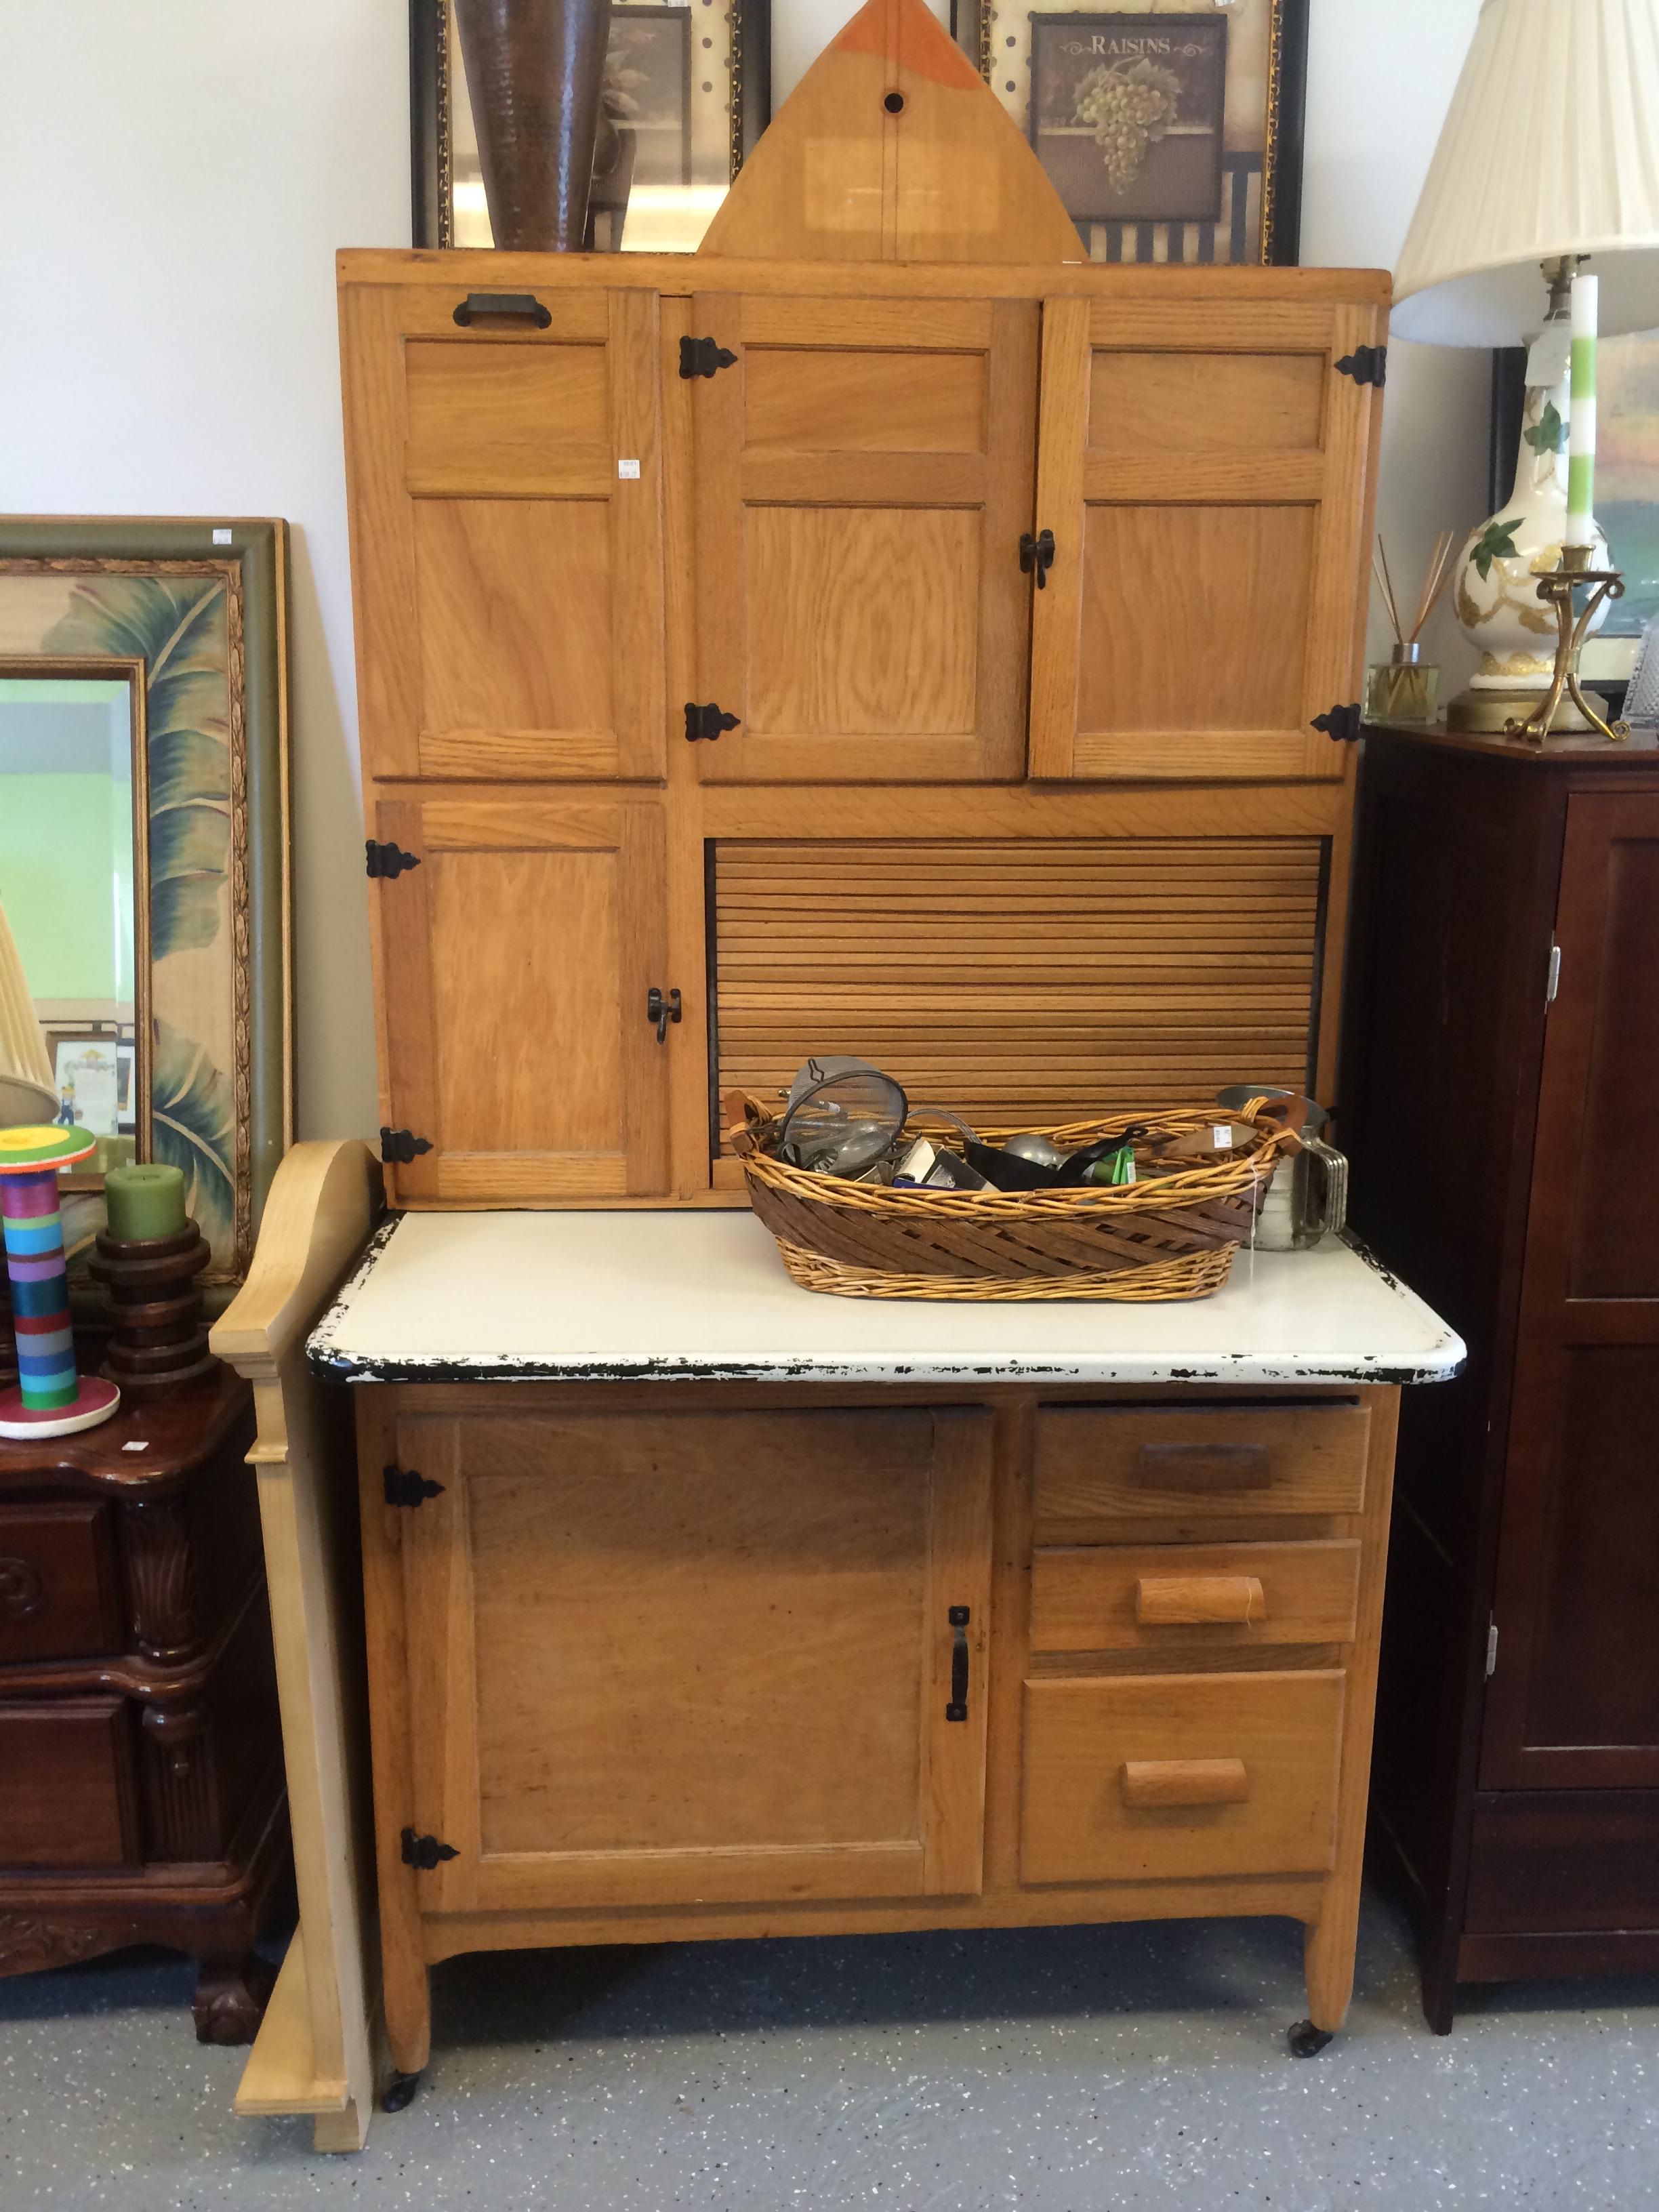 Our Furniture Decor amp More Store